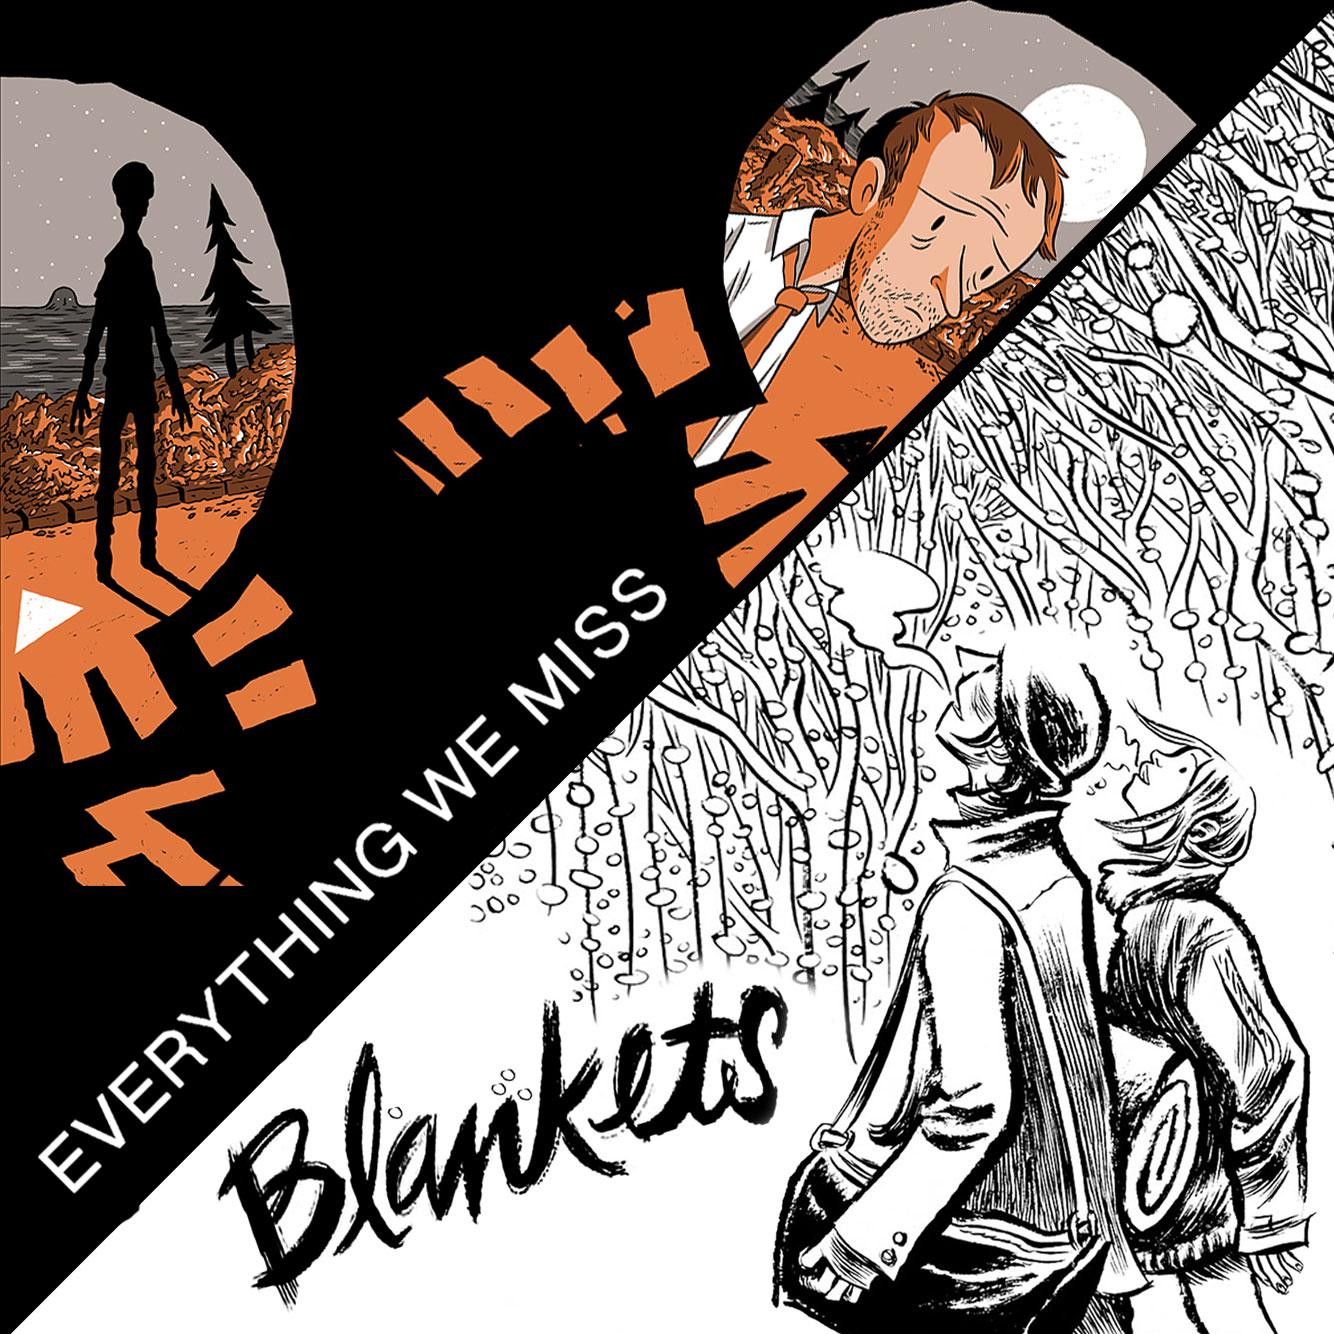 Blankets-EWM-split.jpg